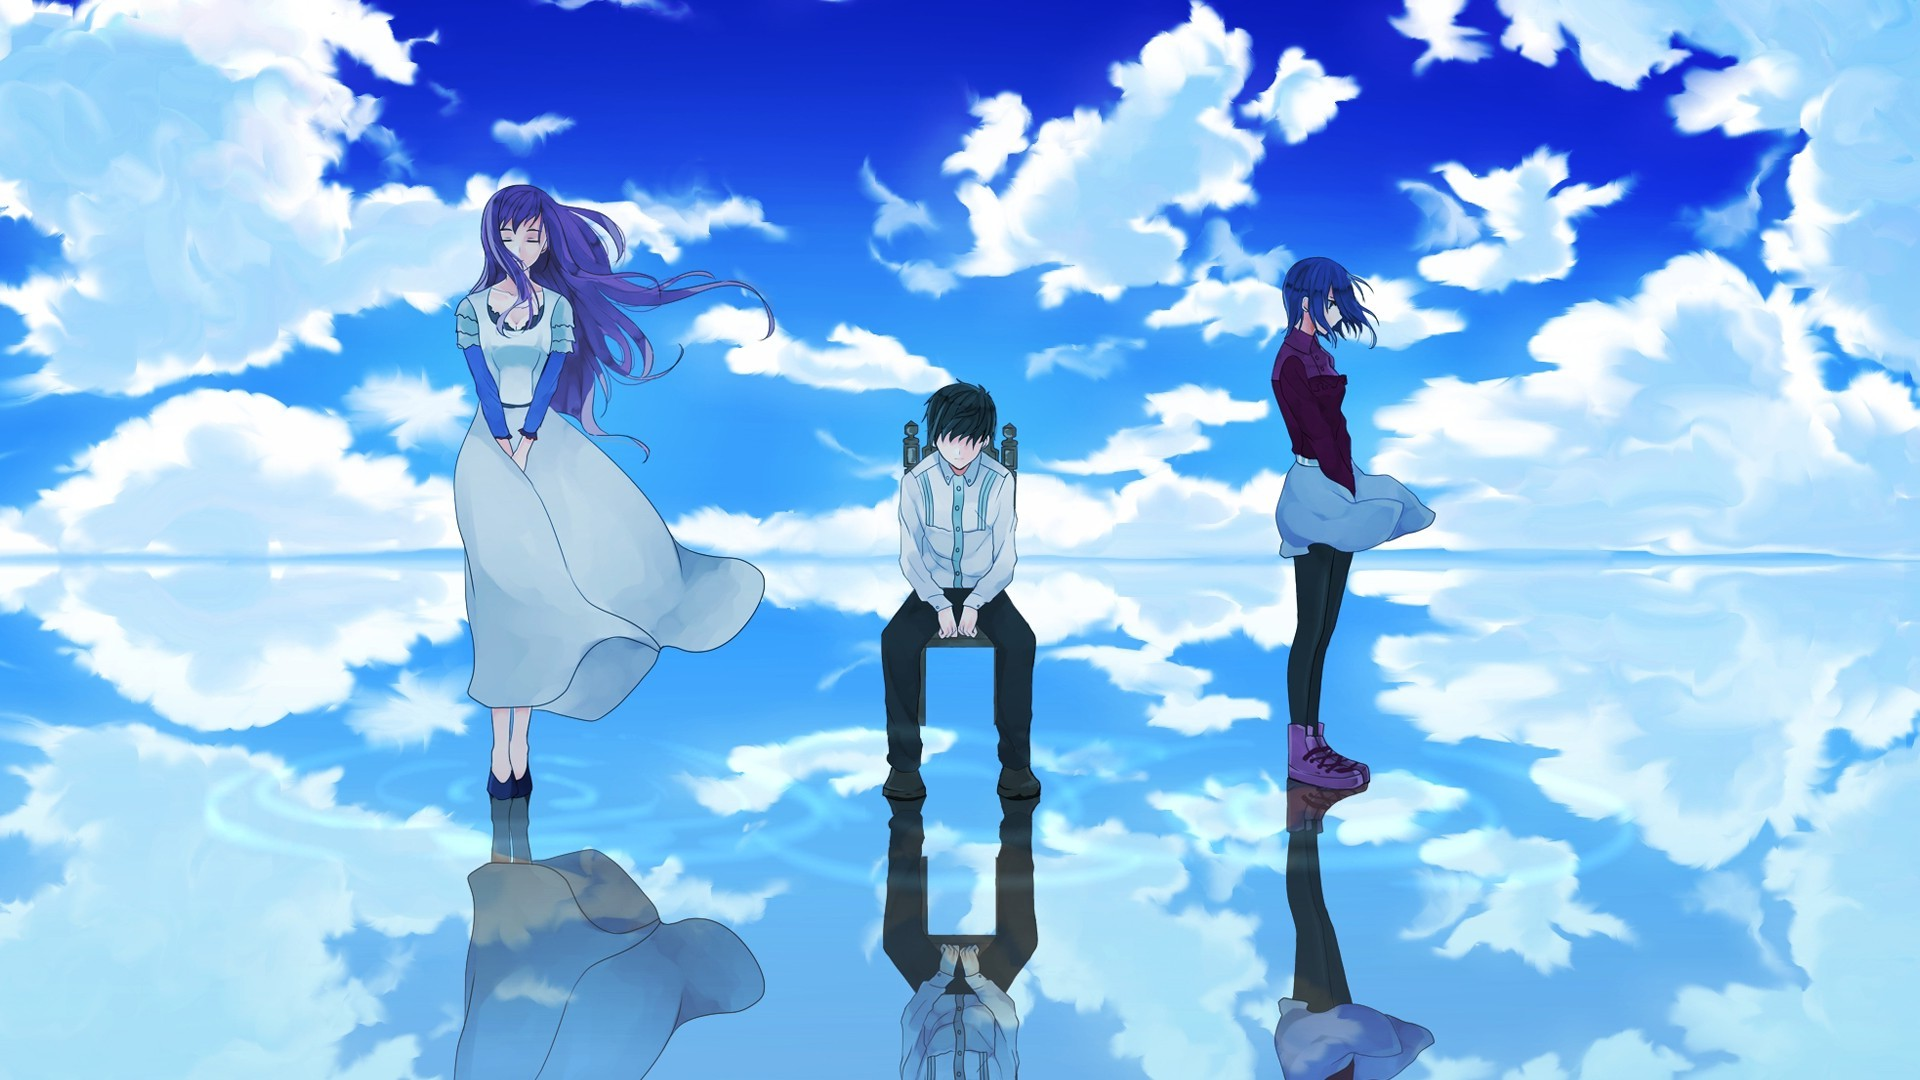 Tokyo Ghoul, Anime, Kaneki Ken, Kirishima Touka, Kamishiro Rize Wallpapers  HD / Desktop and Mobile Backgrounds